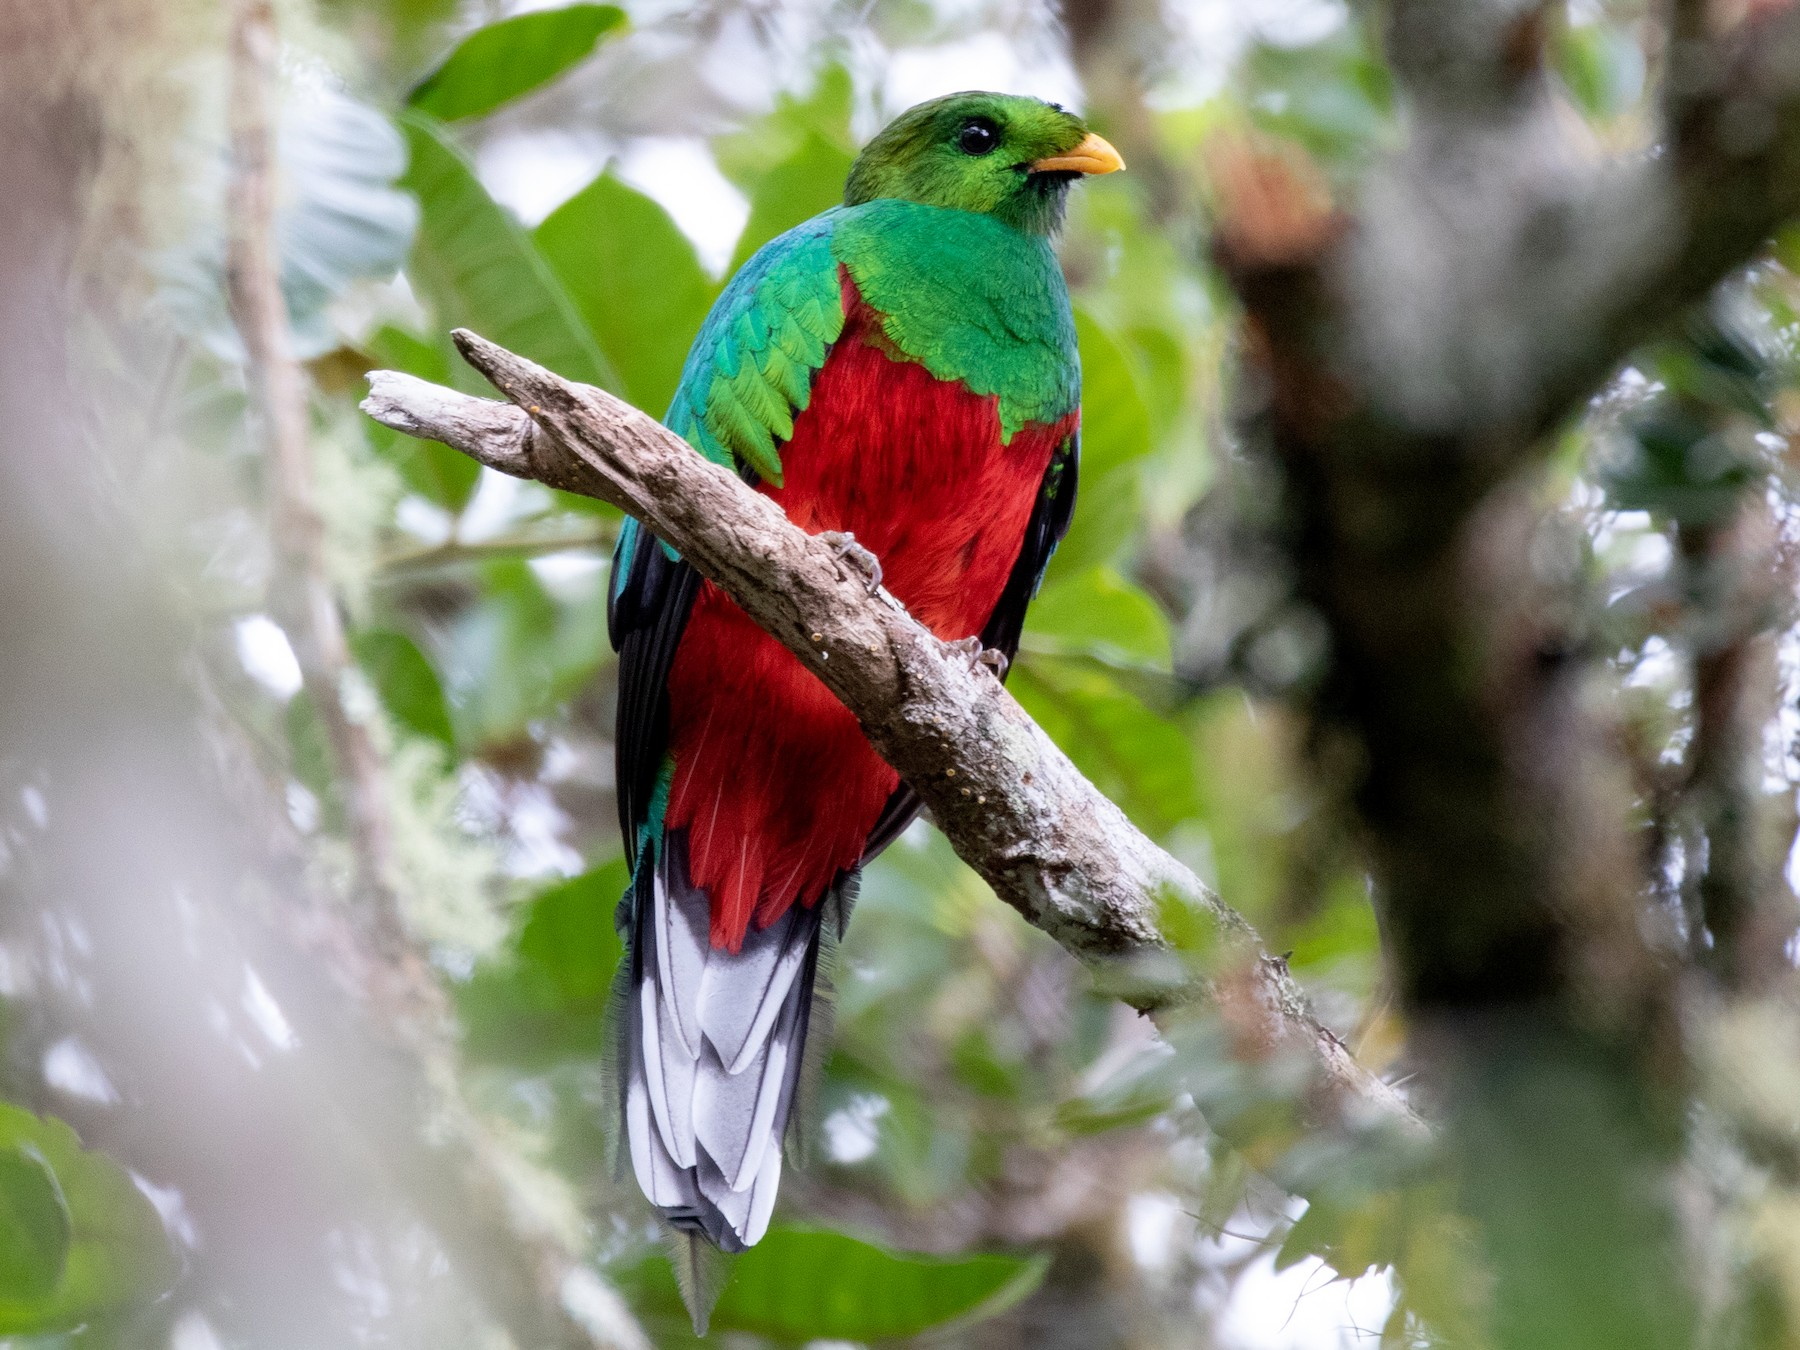 White-tipped Quetzal - Cullen Hanks